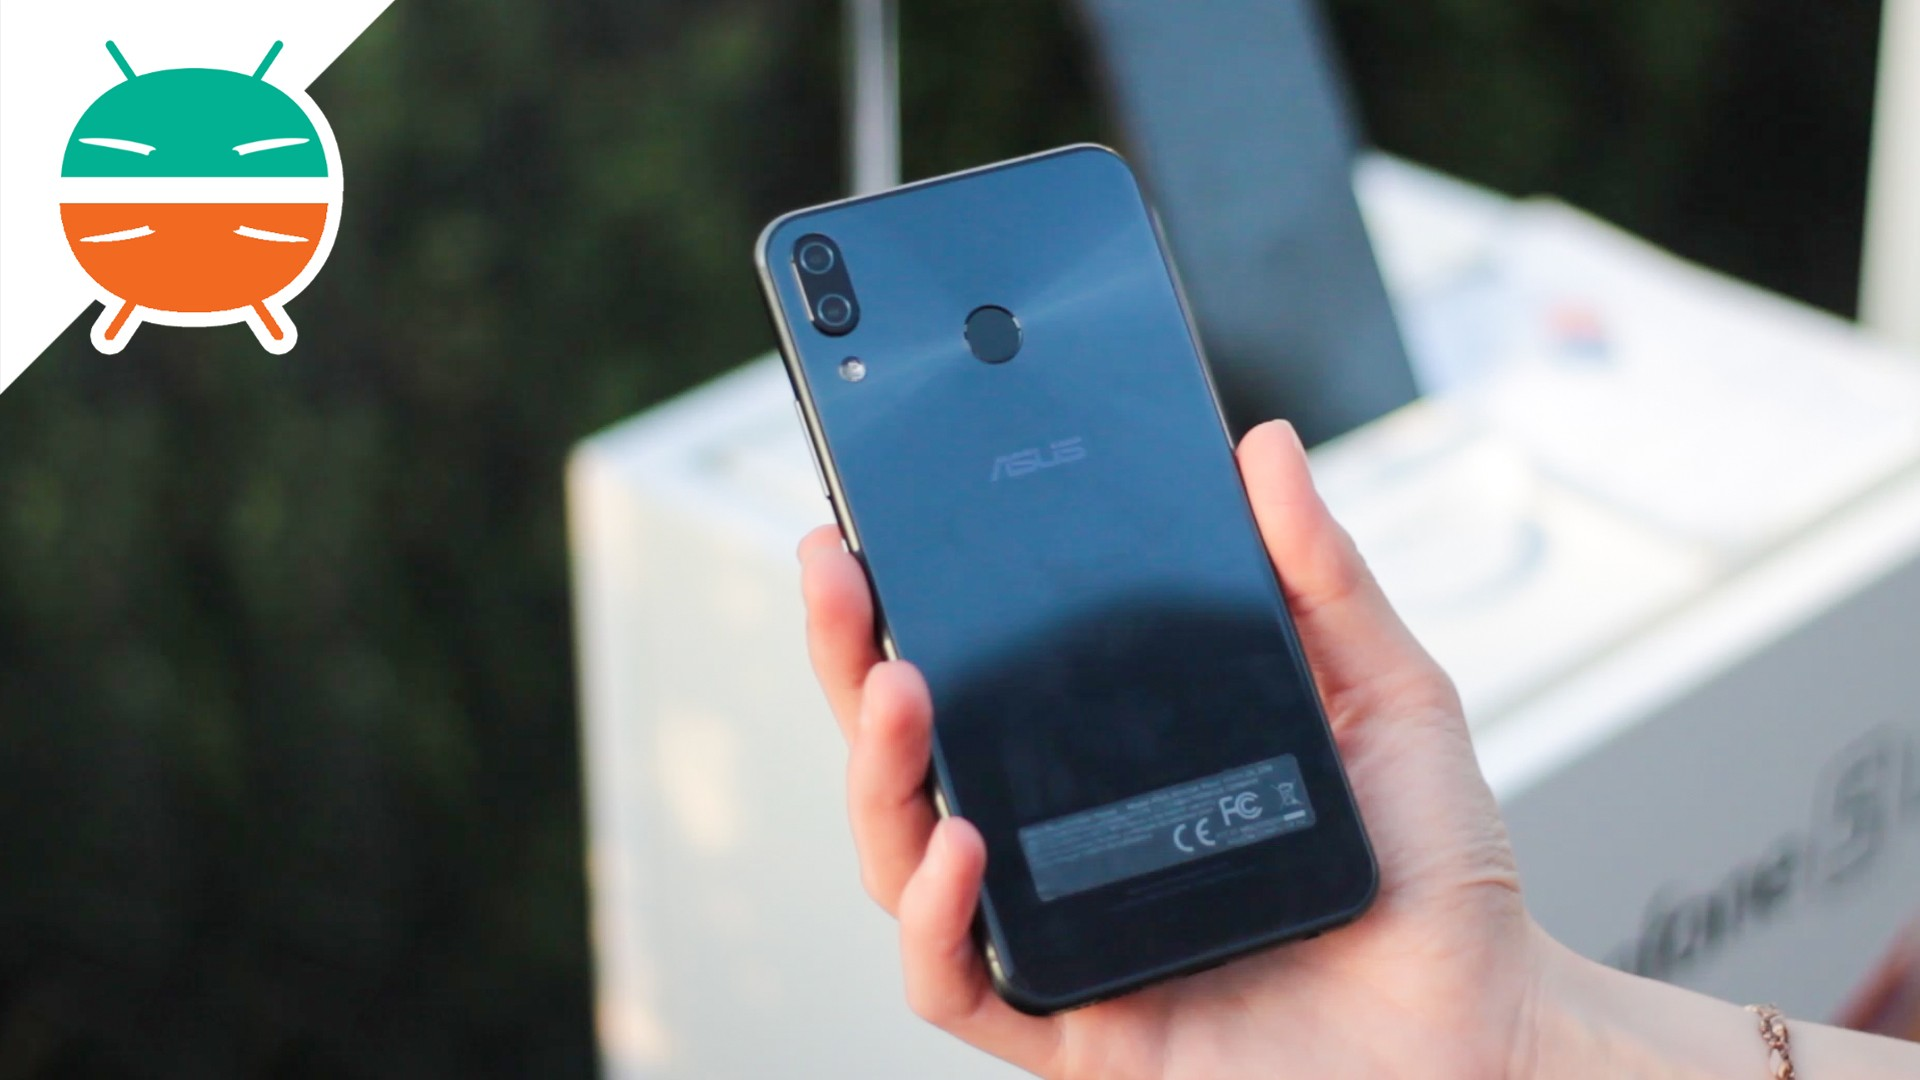 ASUS ZenFone 5 Global - Banggood